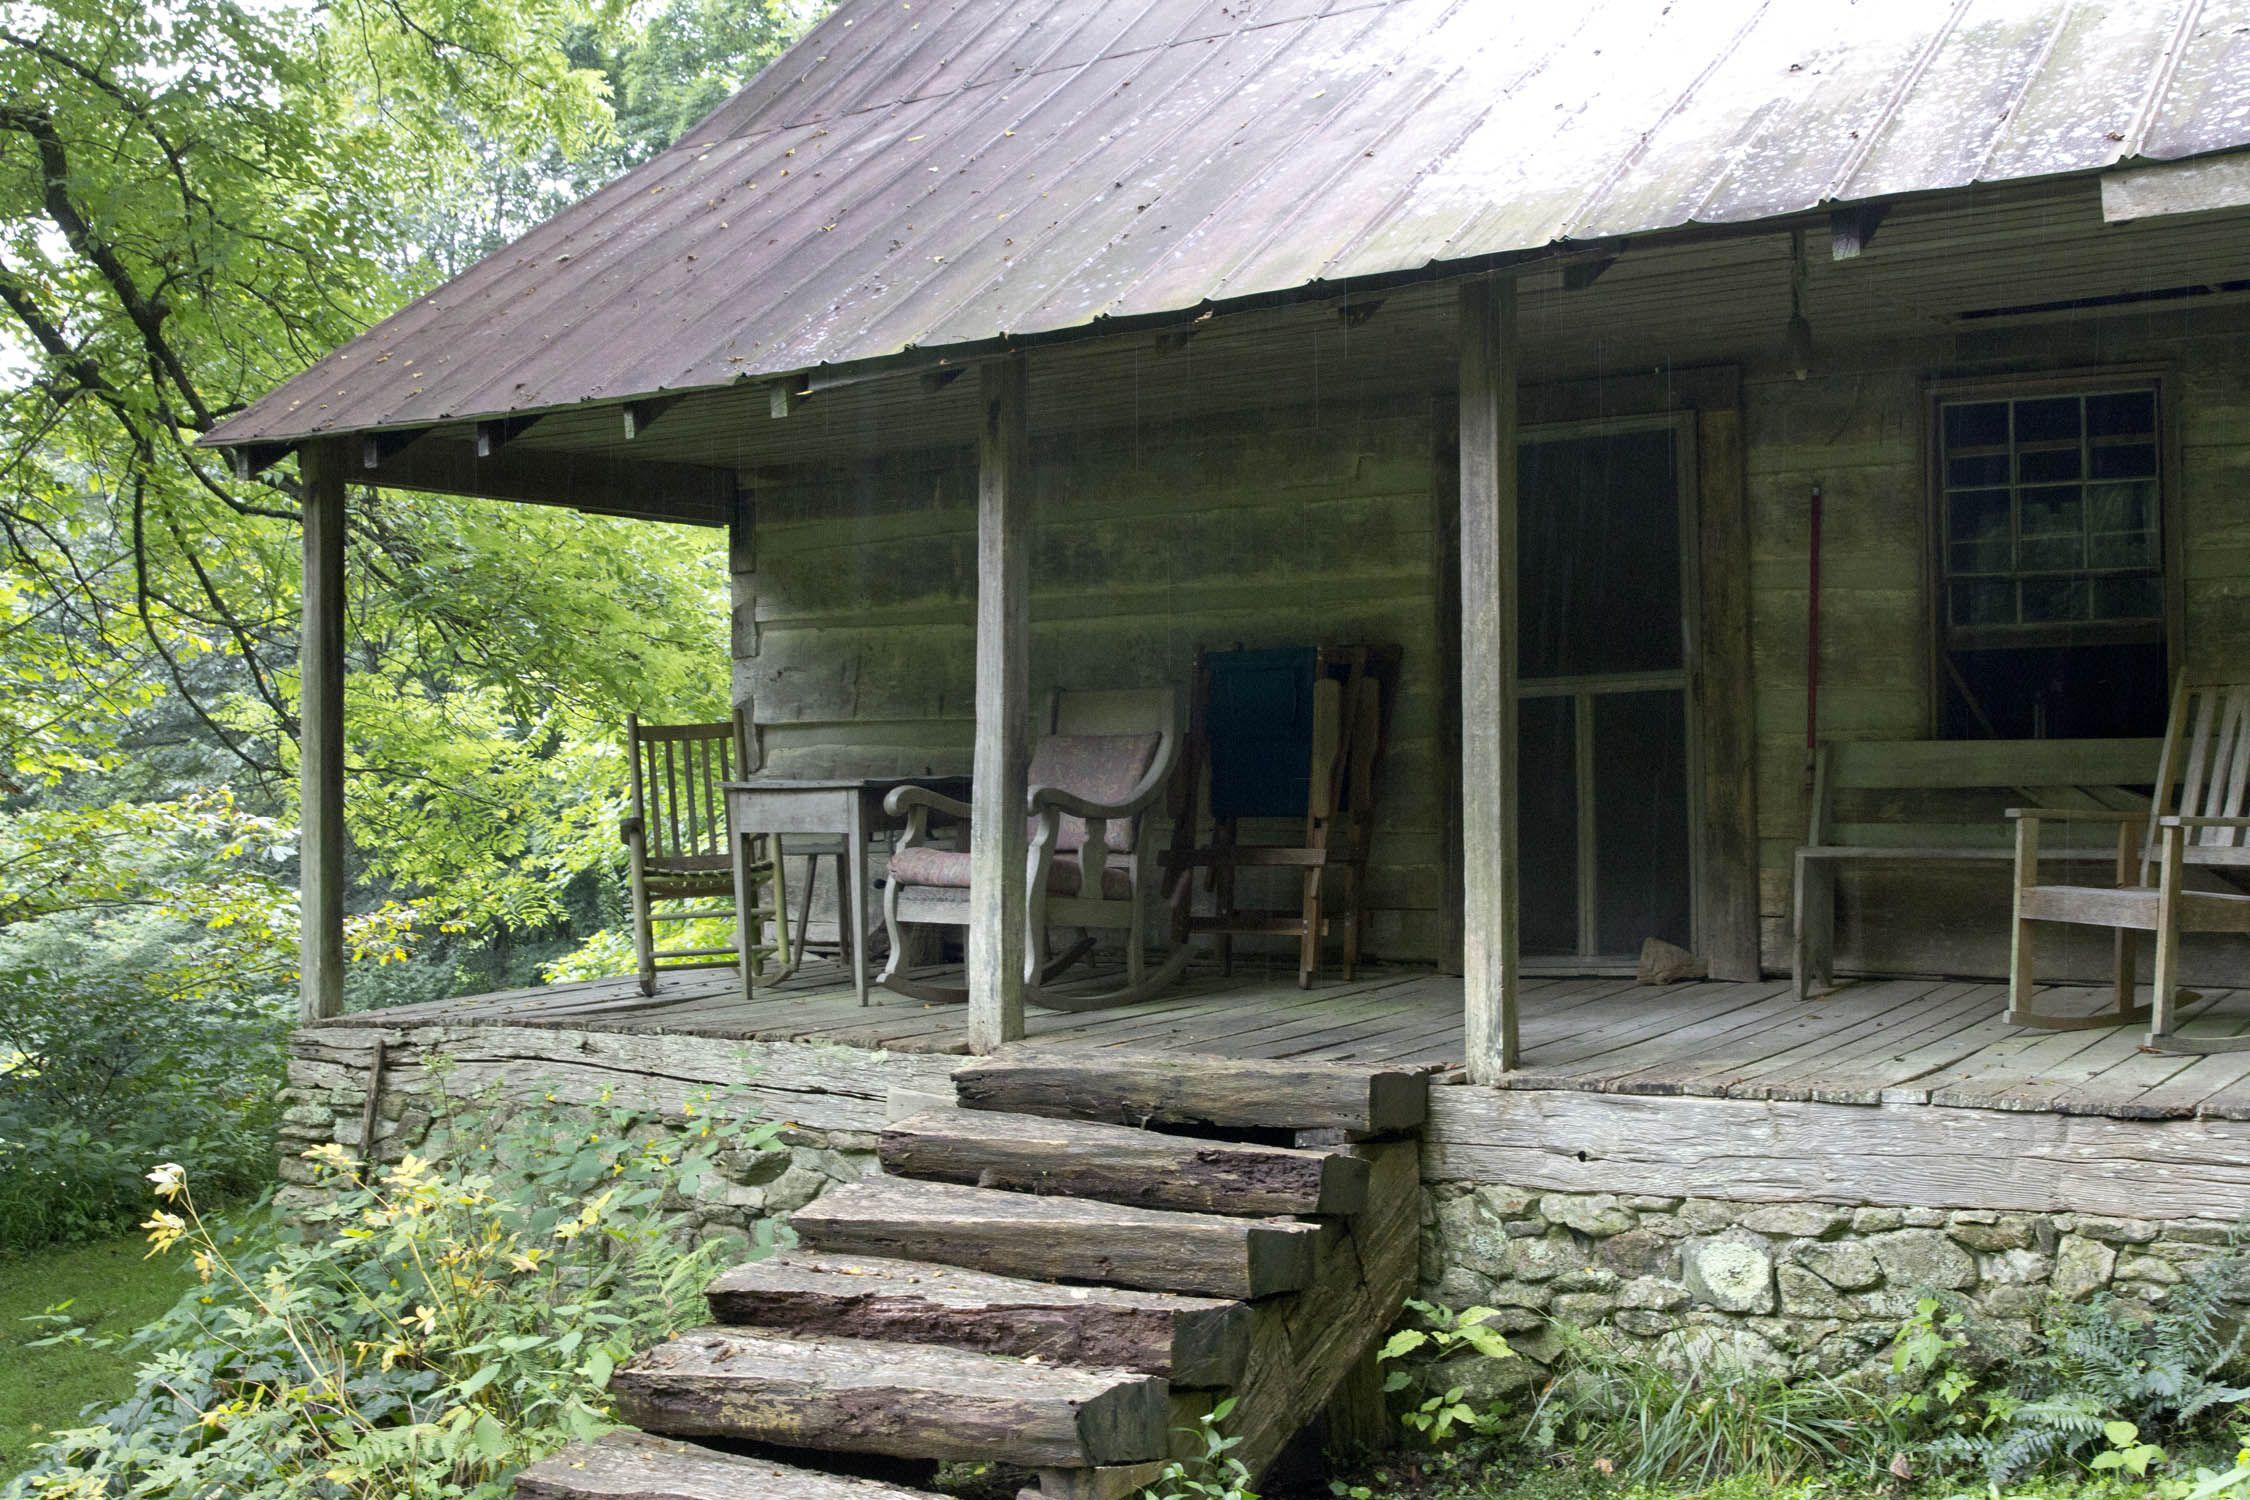 log cabin | Log Cabin Cooking | RUSTIC LOG CABINS ...